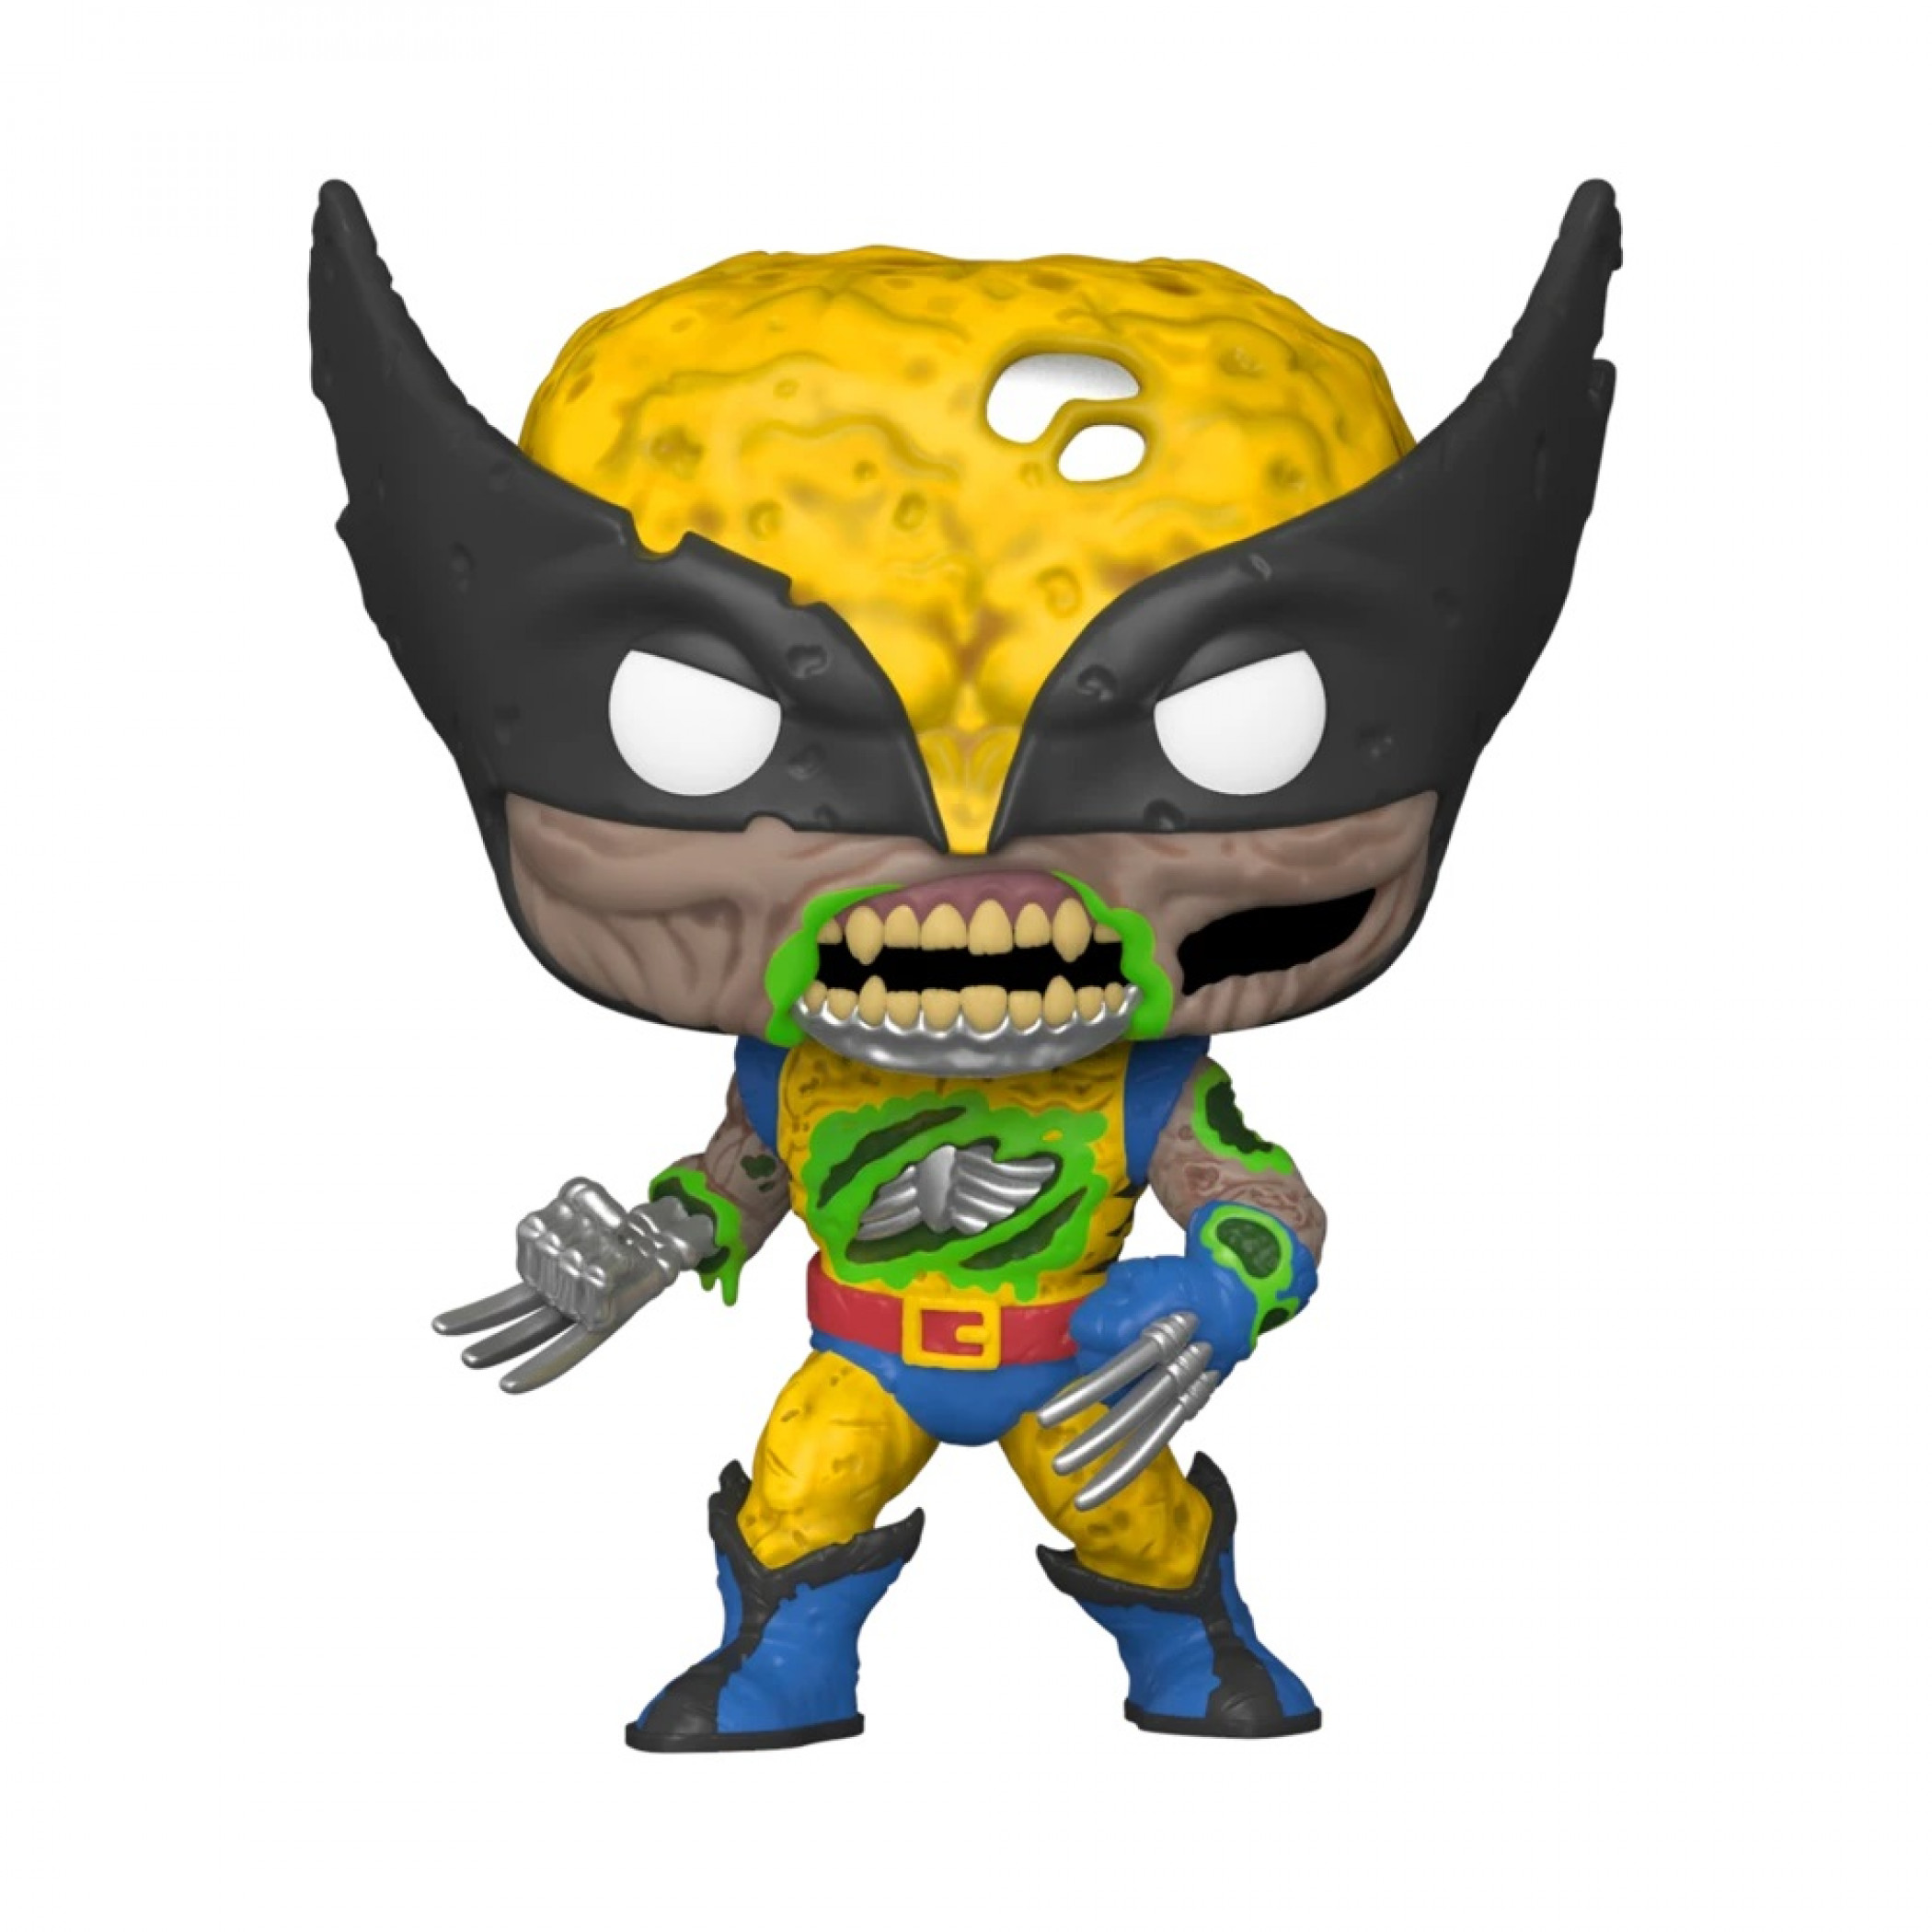 Marvel Zombies Wolverine Funko Pop!